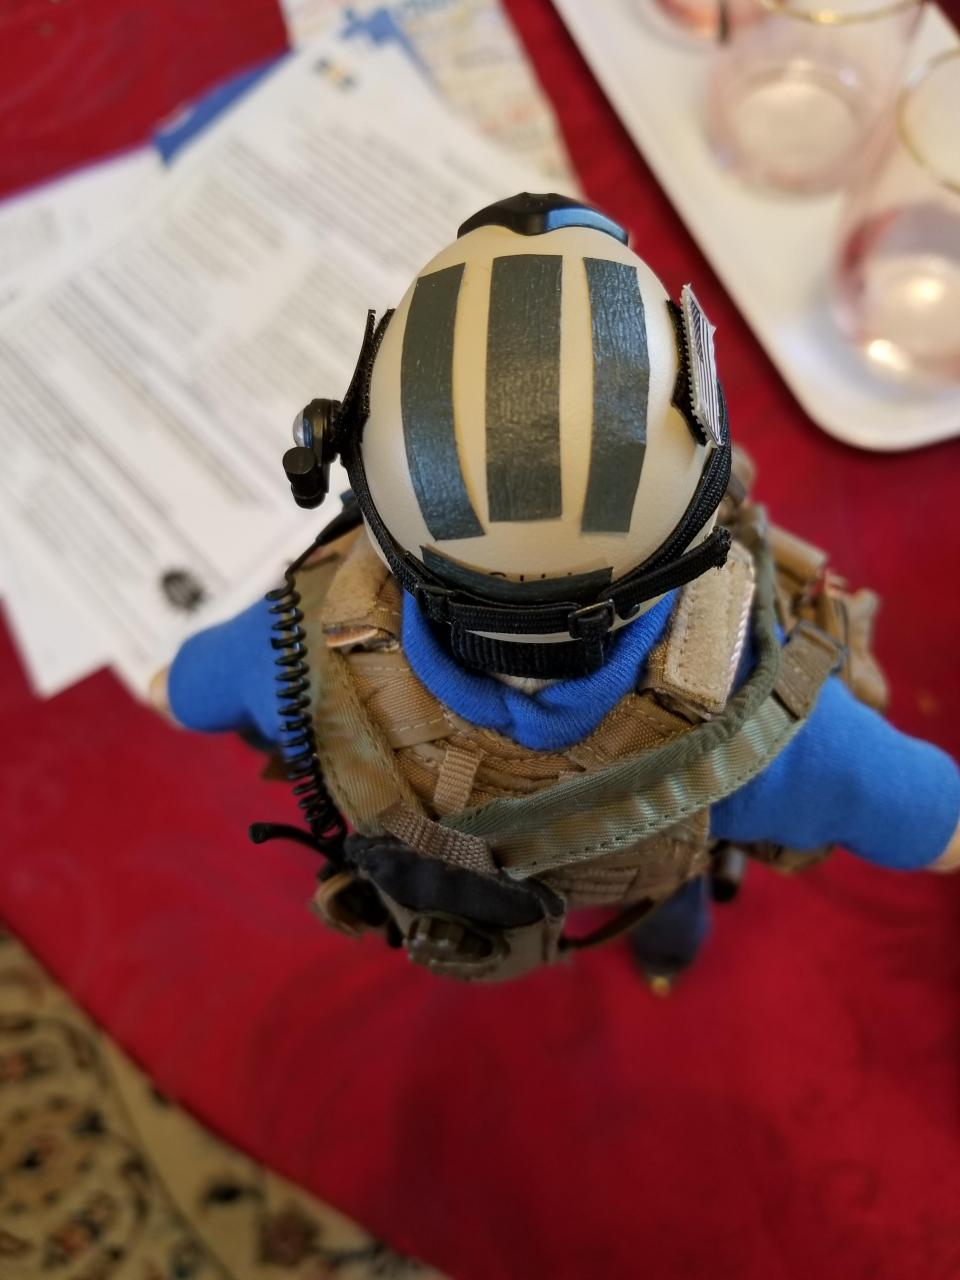 Modern Warfare 2 - Task Force 141 operative in urban wear (pic heavy)-8_-_iogaalw[1]-jpg